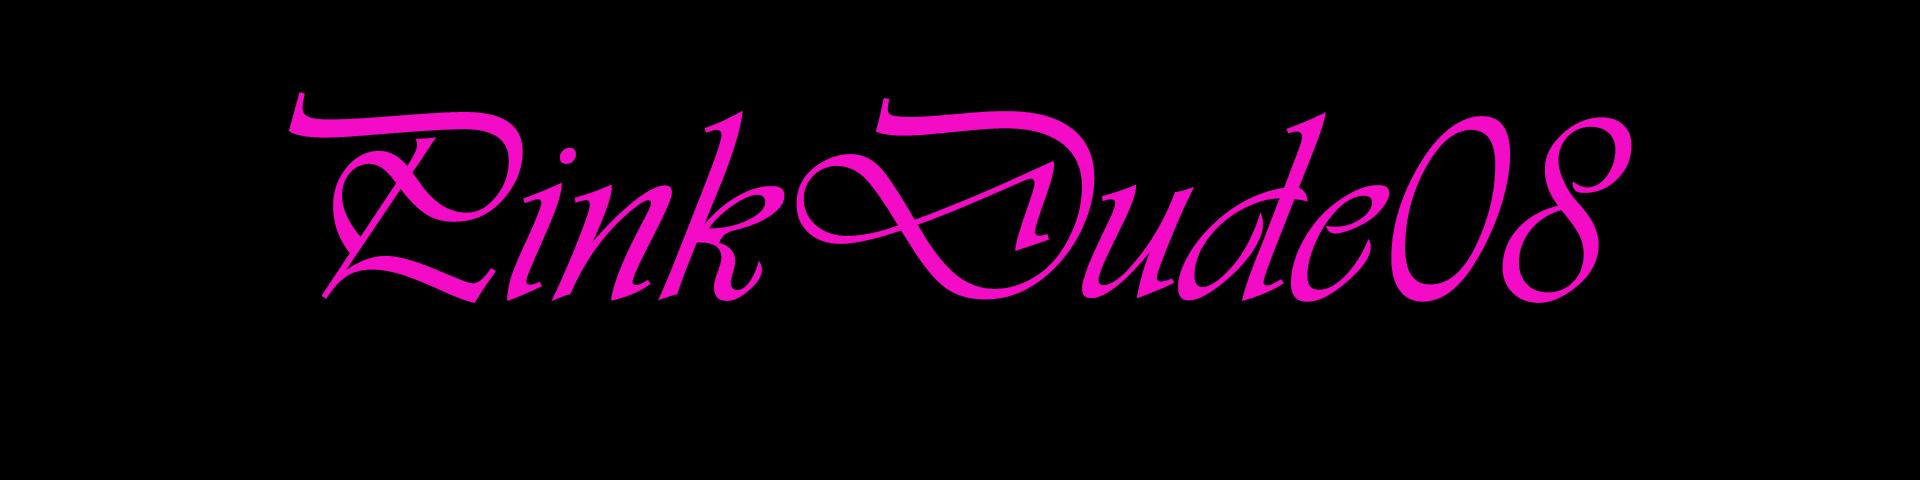 PinkDude08